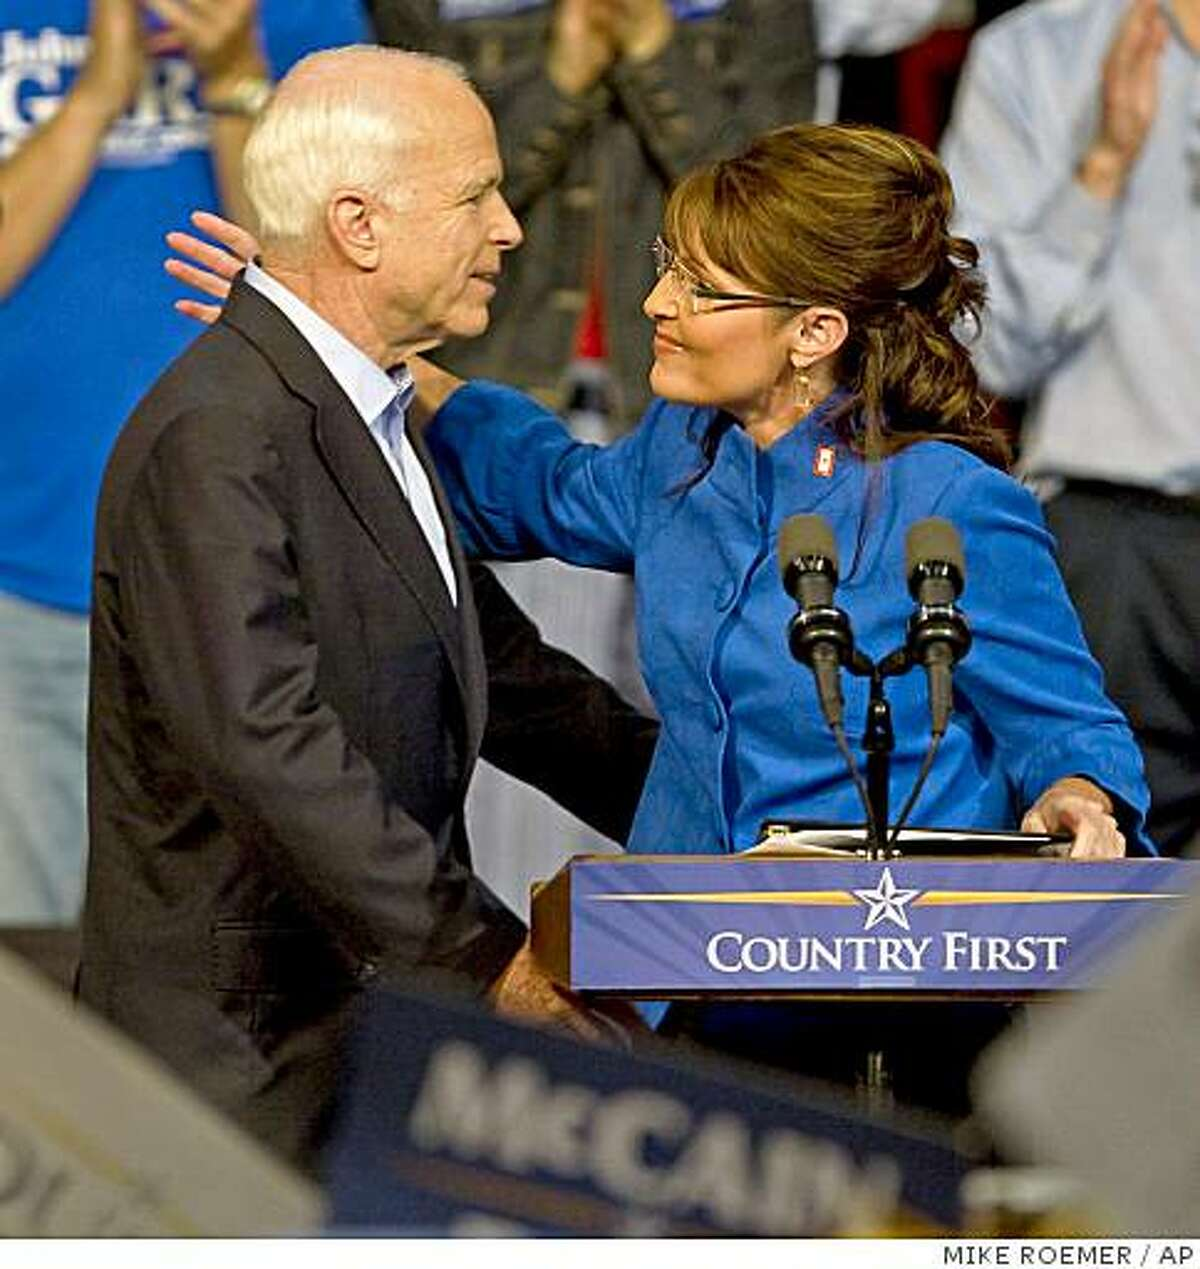 Republican presidential candidate, Sen. John McCain, R-Ariz., hugs vice presidential running mate, Alaska Gov. Sarah Palin, during a rally, Thursday, Sept. 18, 2008, in Green Bay, Wis.